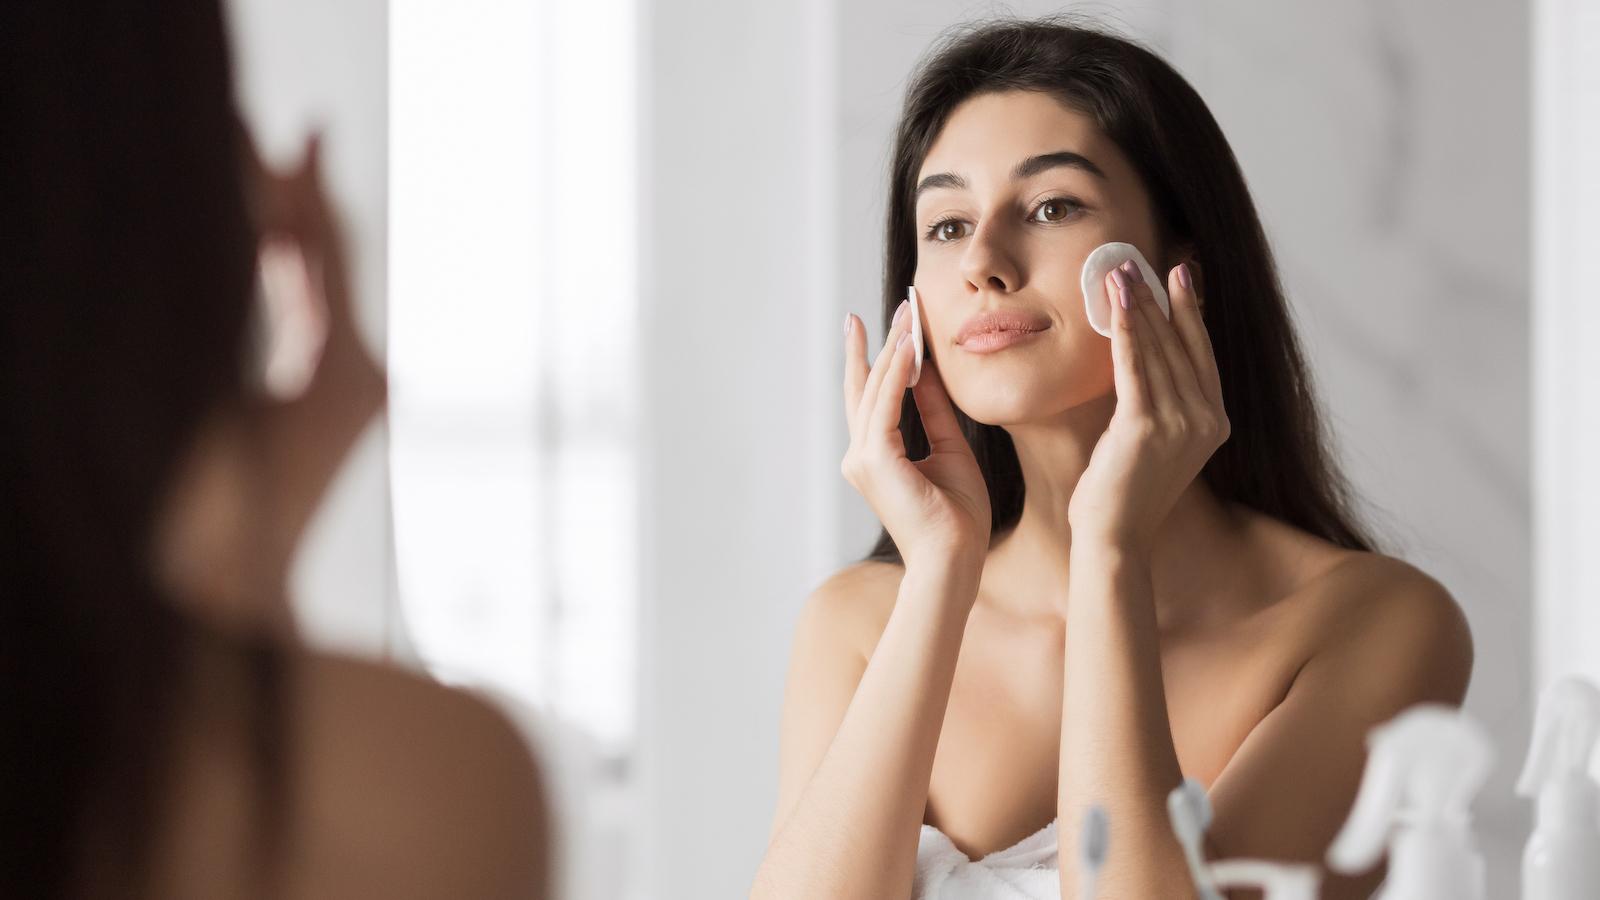 Pure healthy skin concept